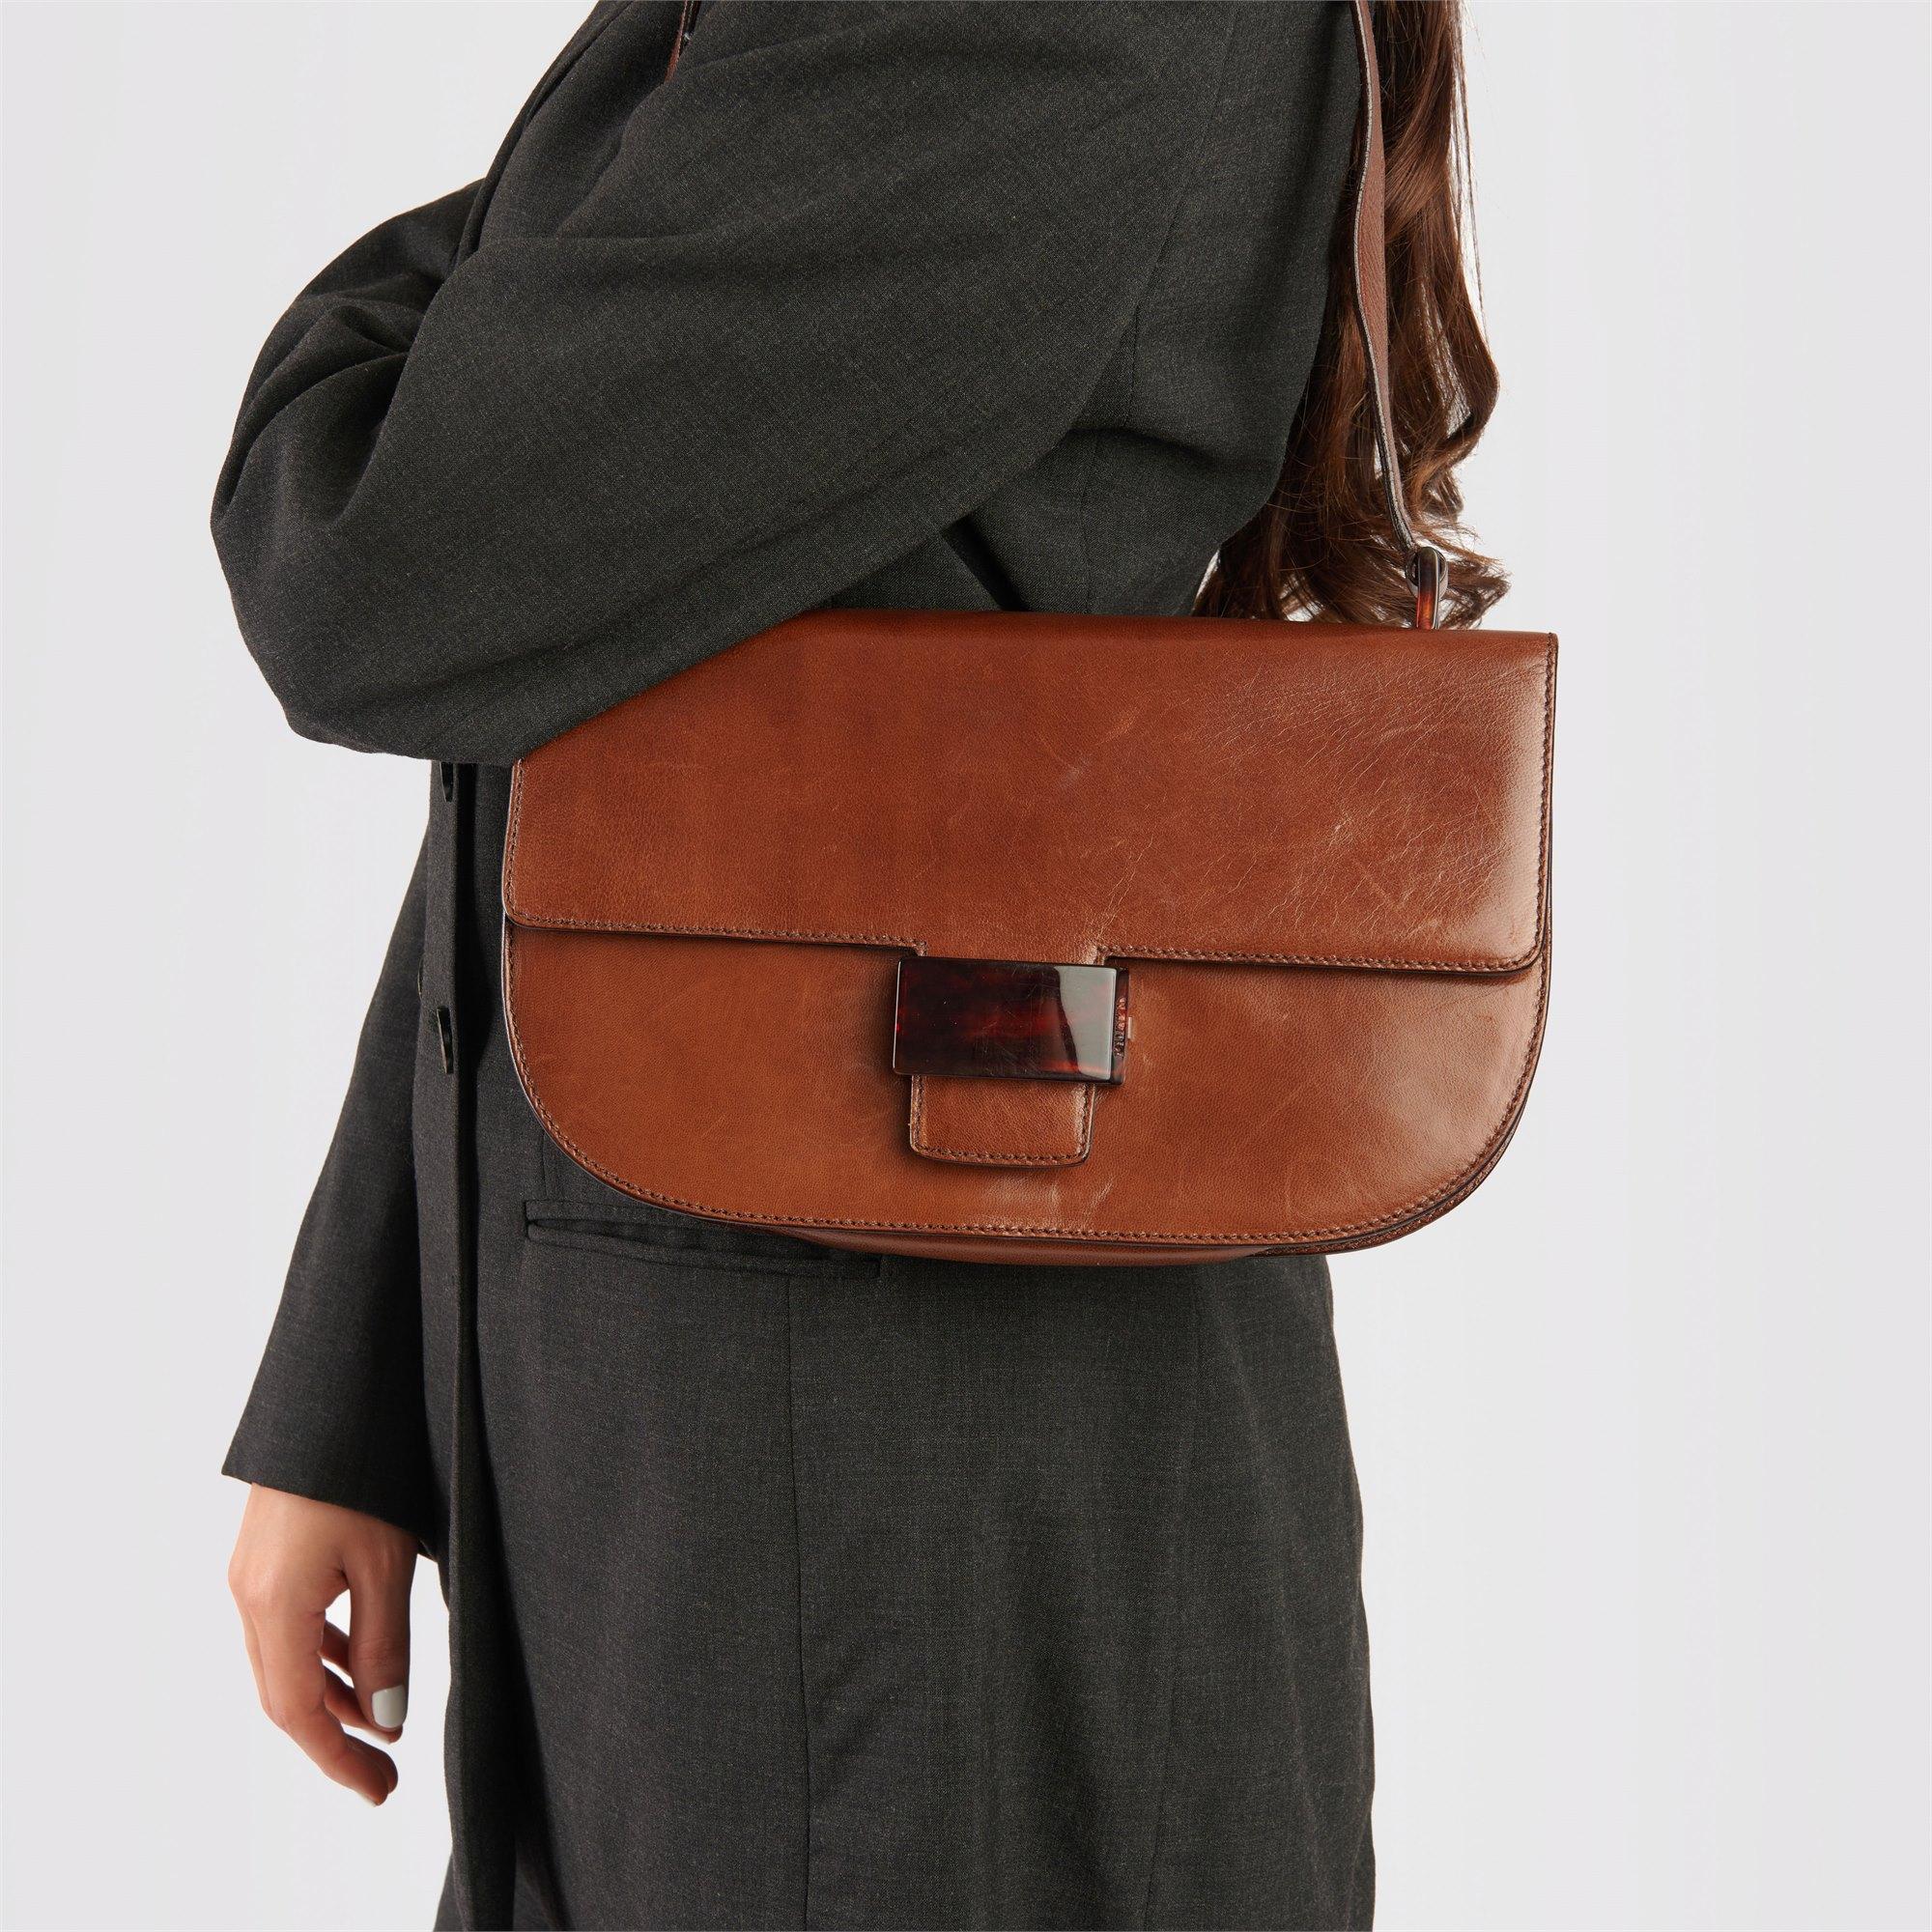 Prada Corino Calfskin Leather Vintage Bachel